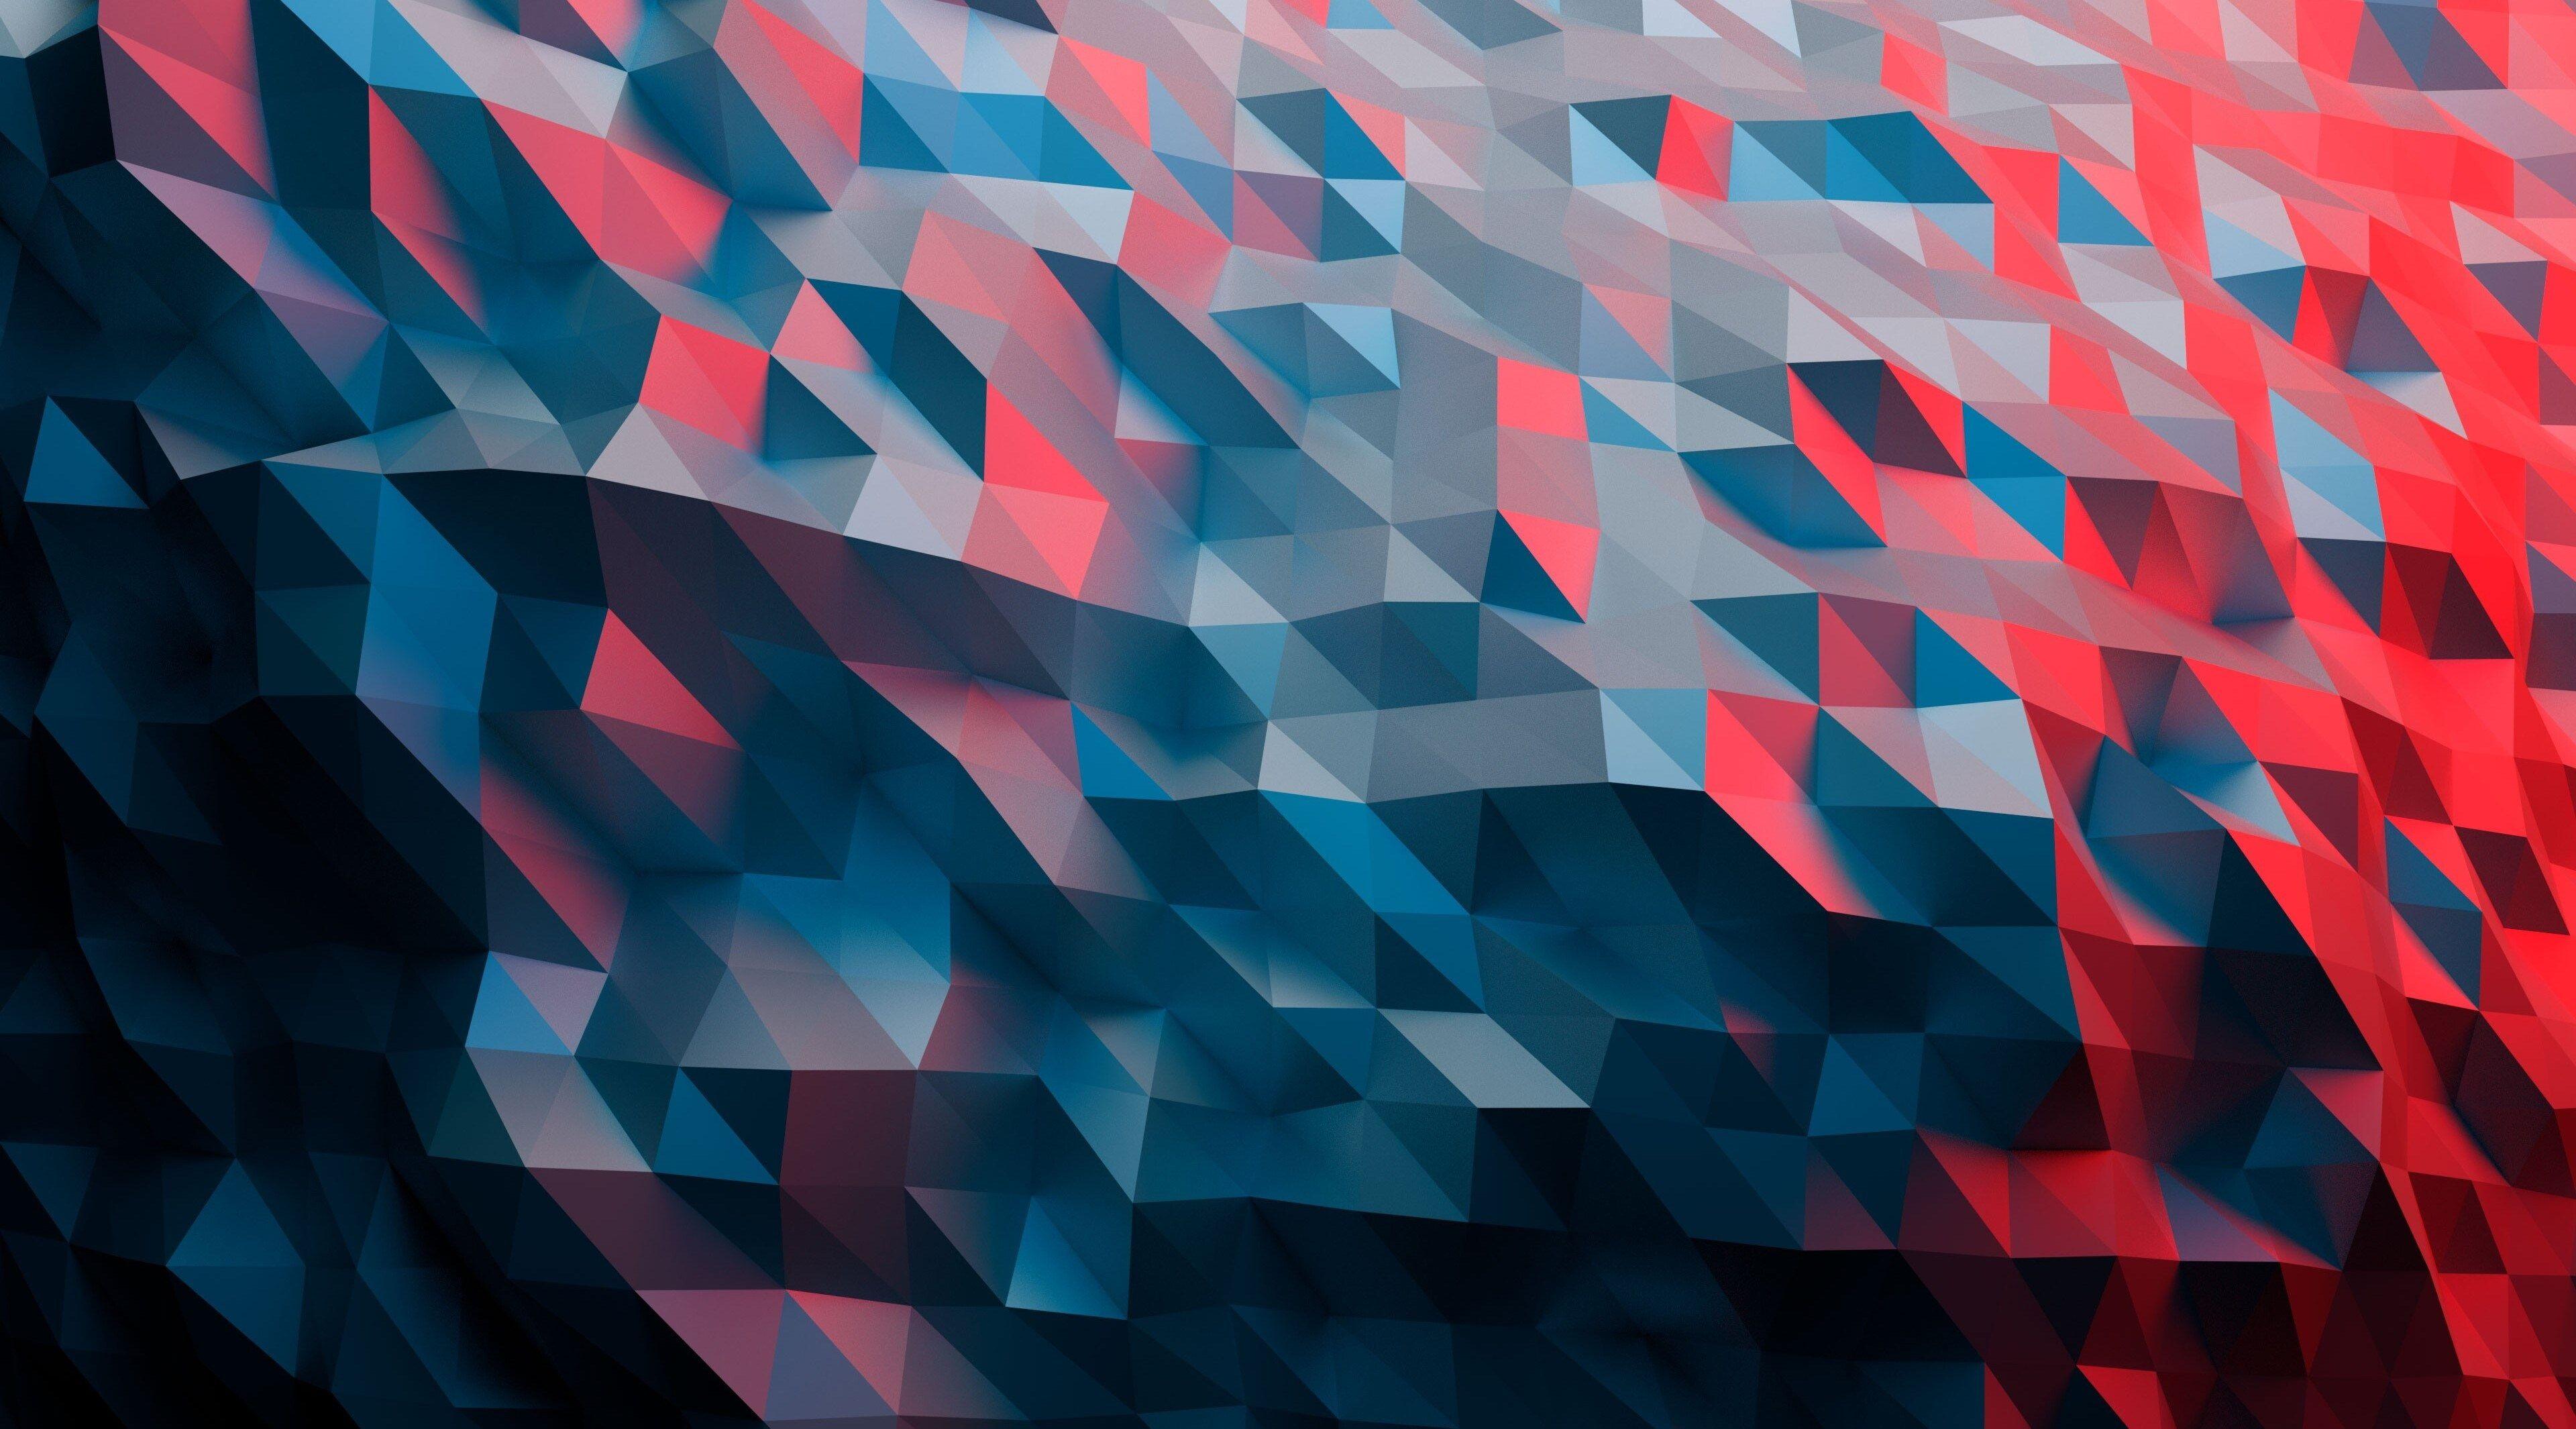 3840x2130 polygon 4k image of best wallpaper